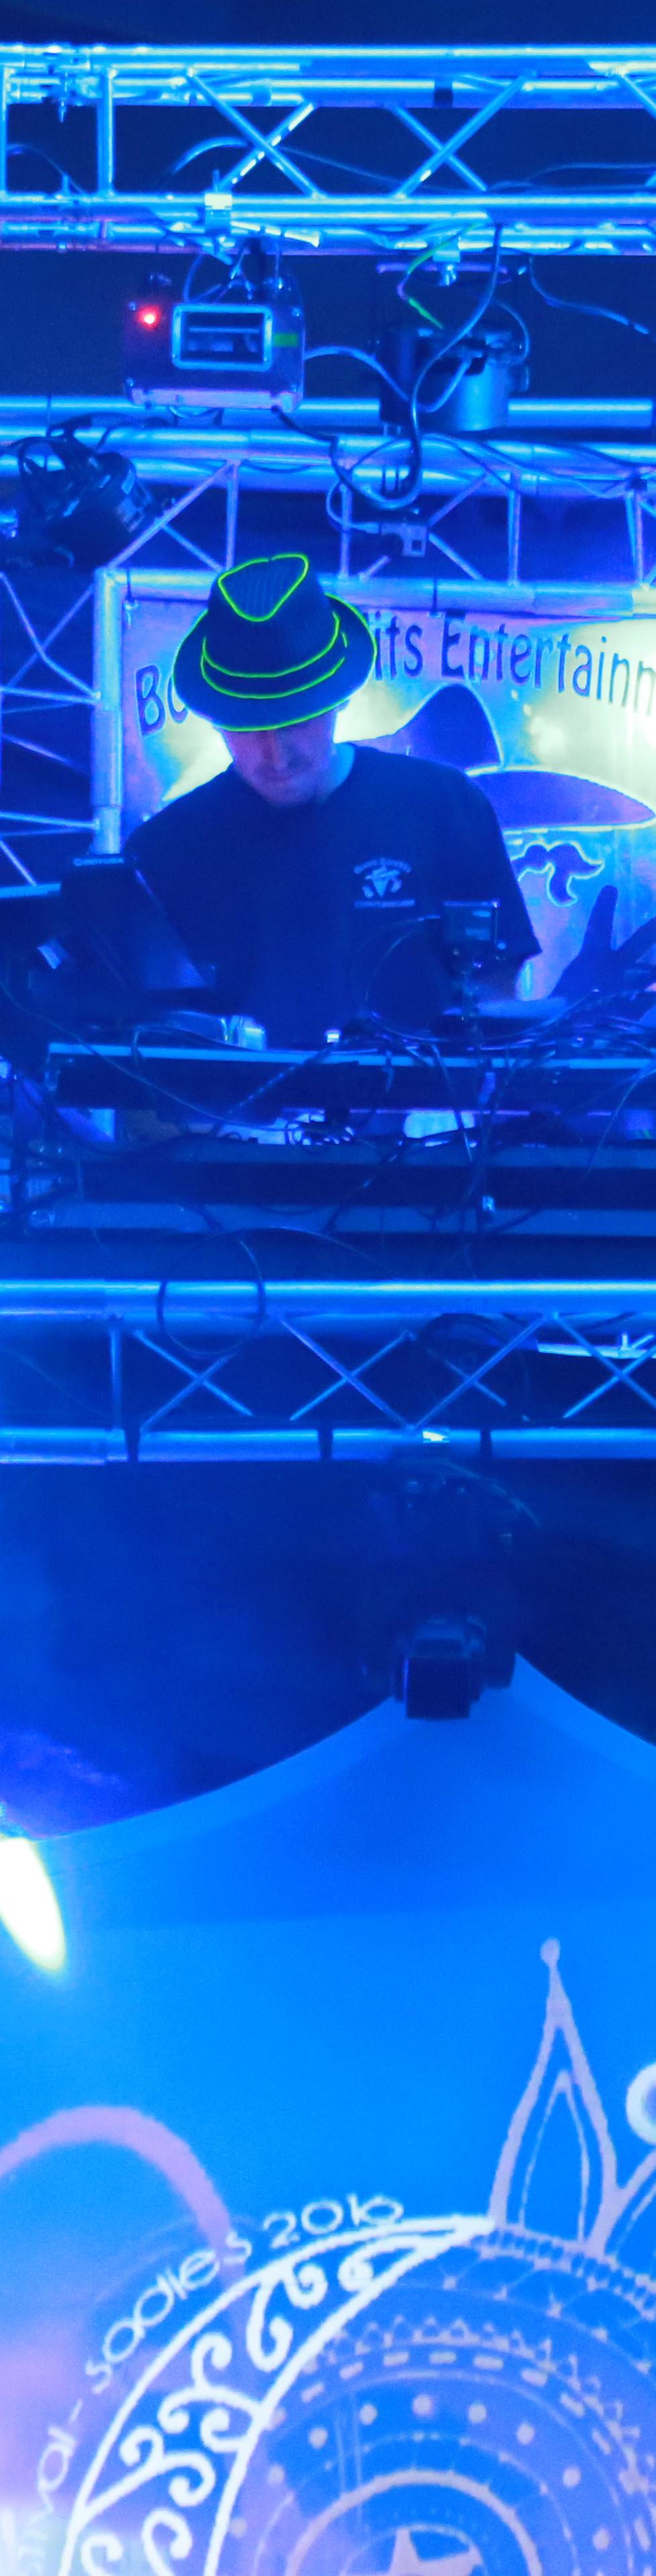 Festival DJ Stage